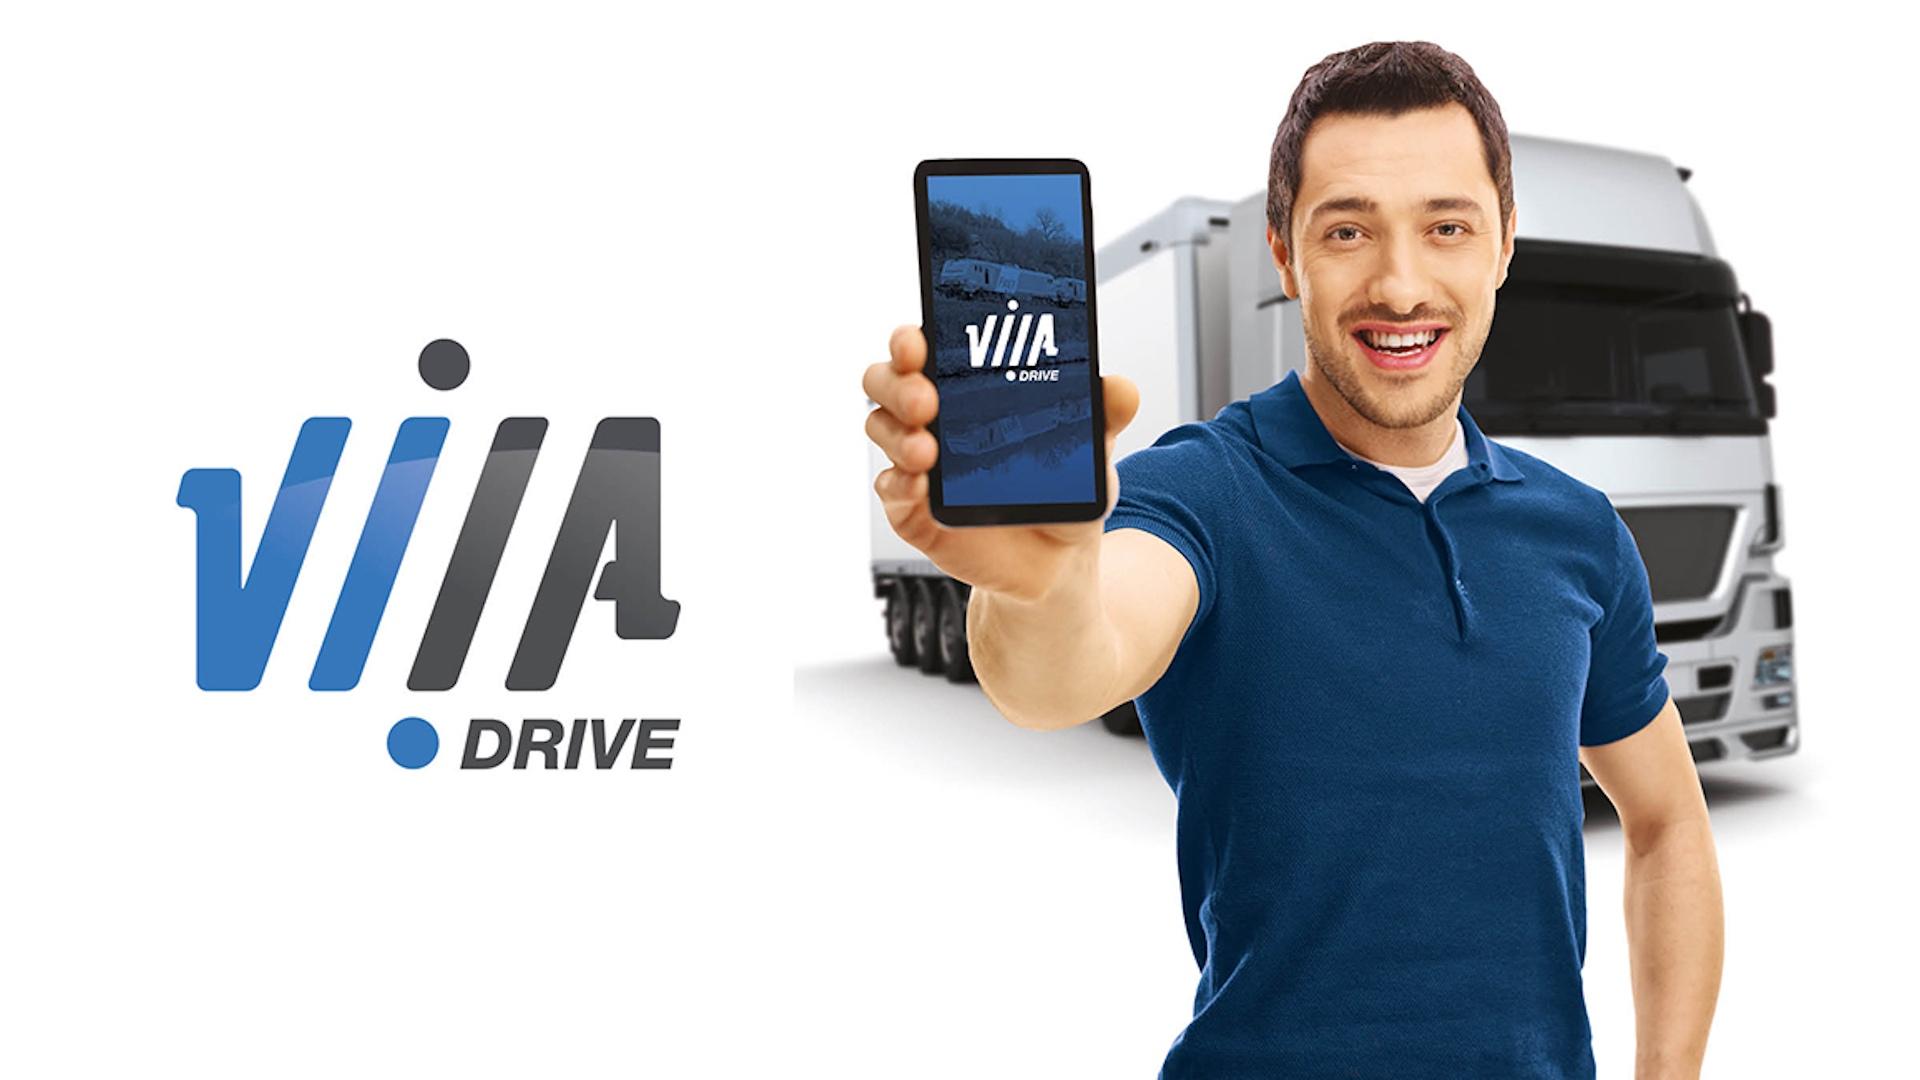 [Focus projet] VIIA : un projet sur-mesure